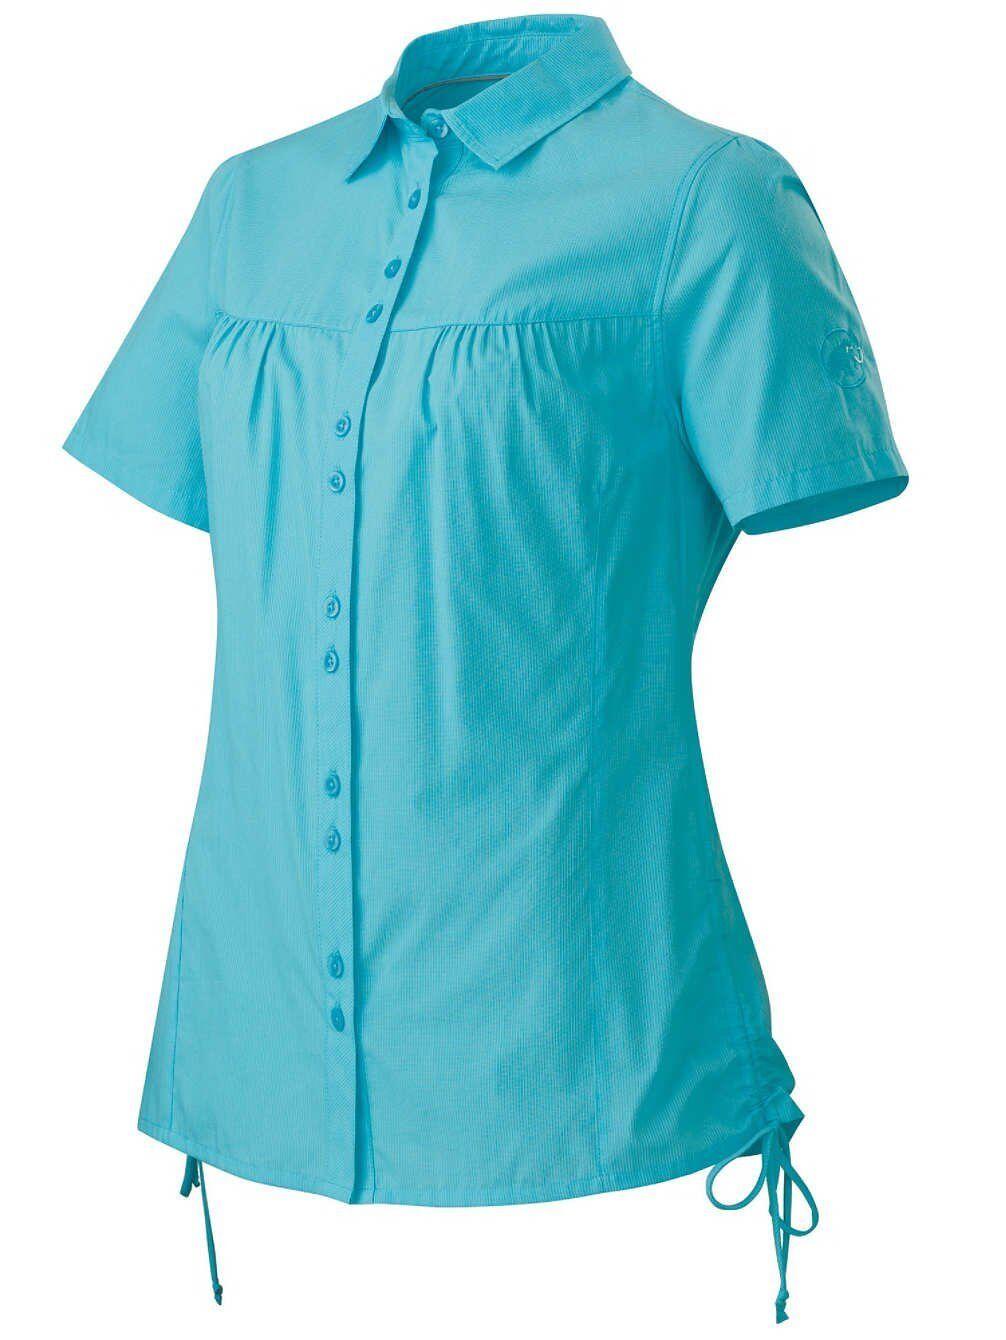 MAMMUT valyn Camicia Donna Blusa facilmente geruchsbeutral facile da pulire UVP